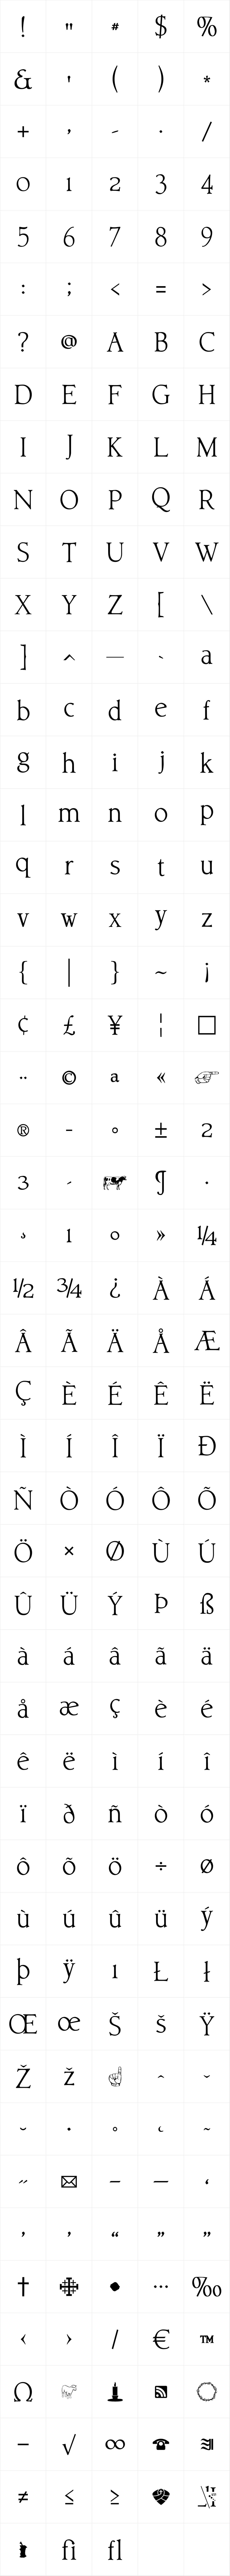 LibrumE Book